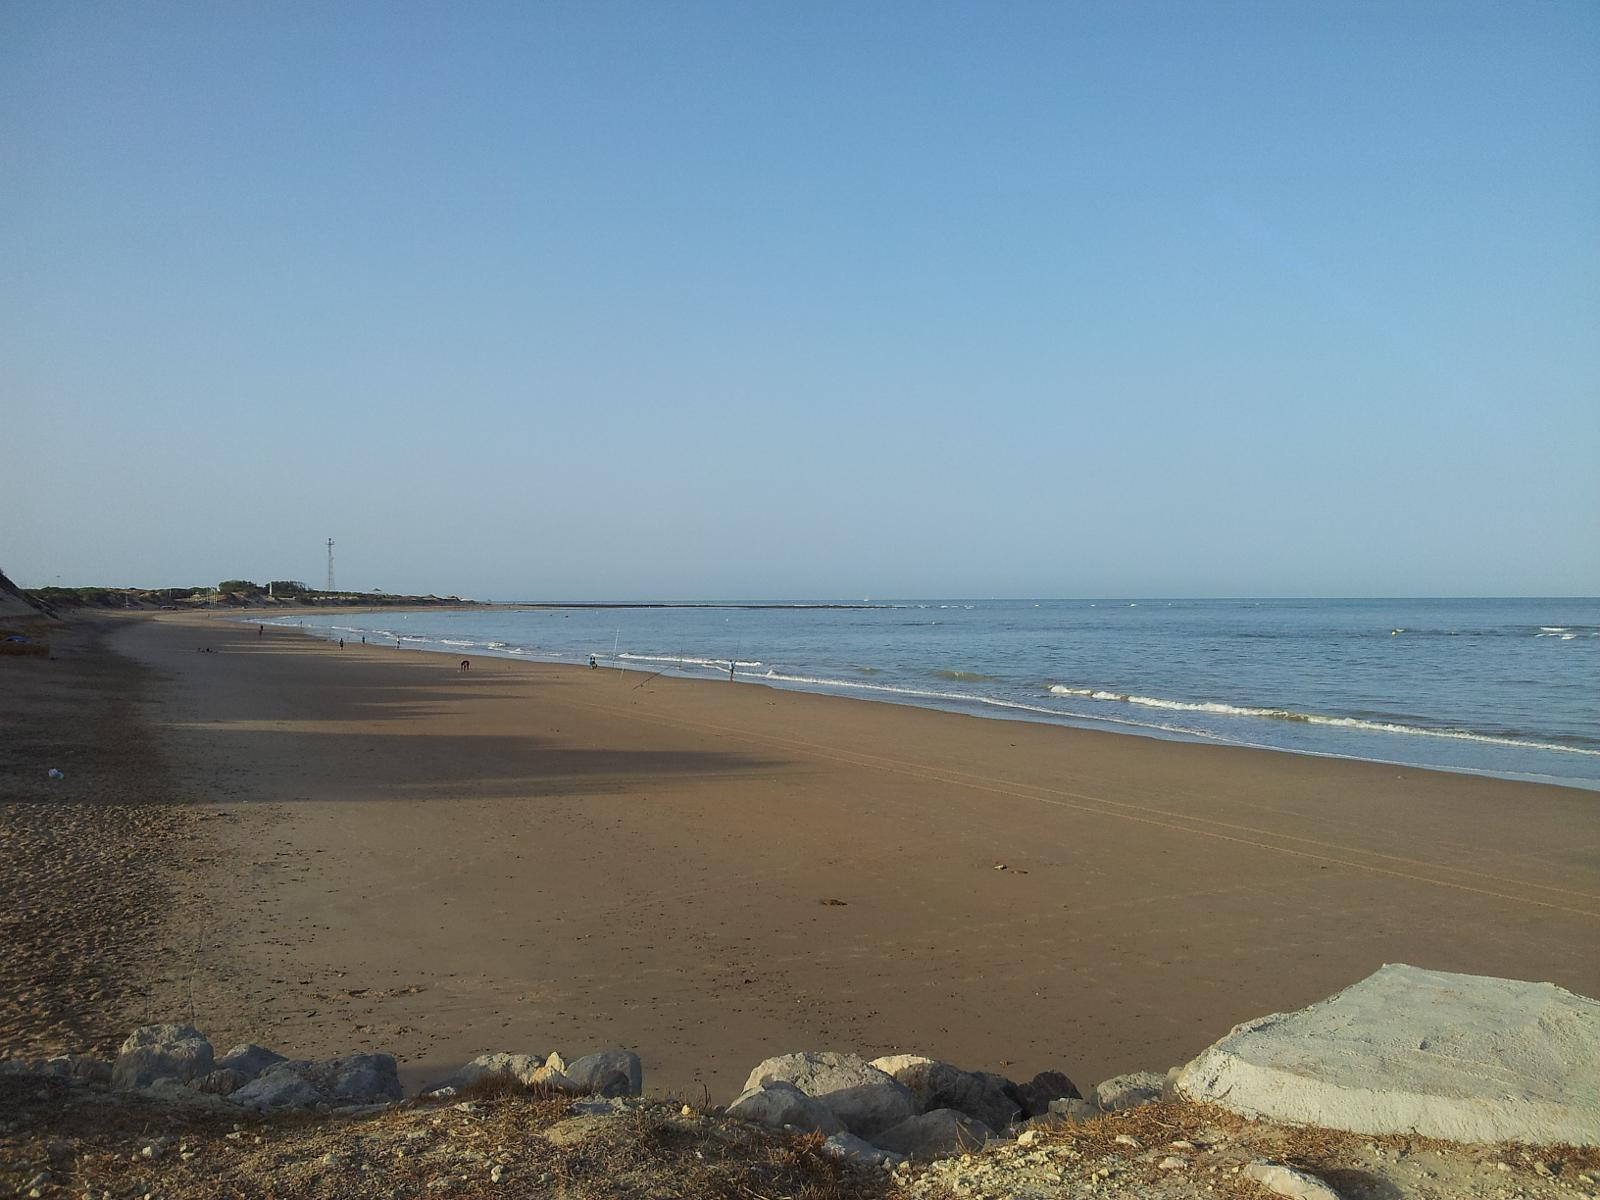 Spot Playa de Punta Candor